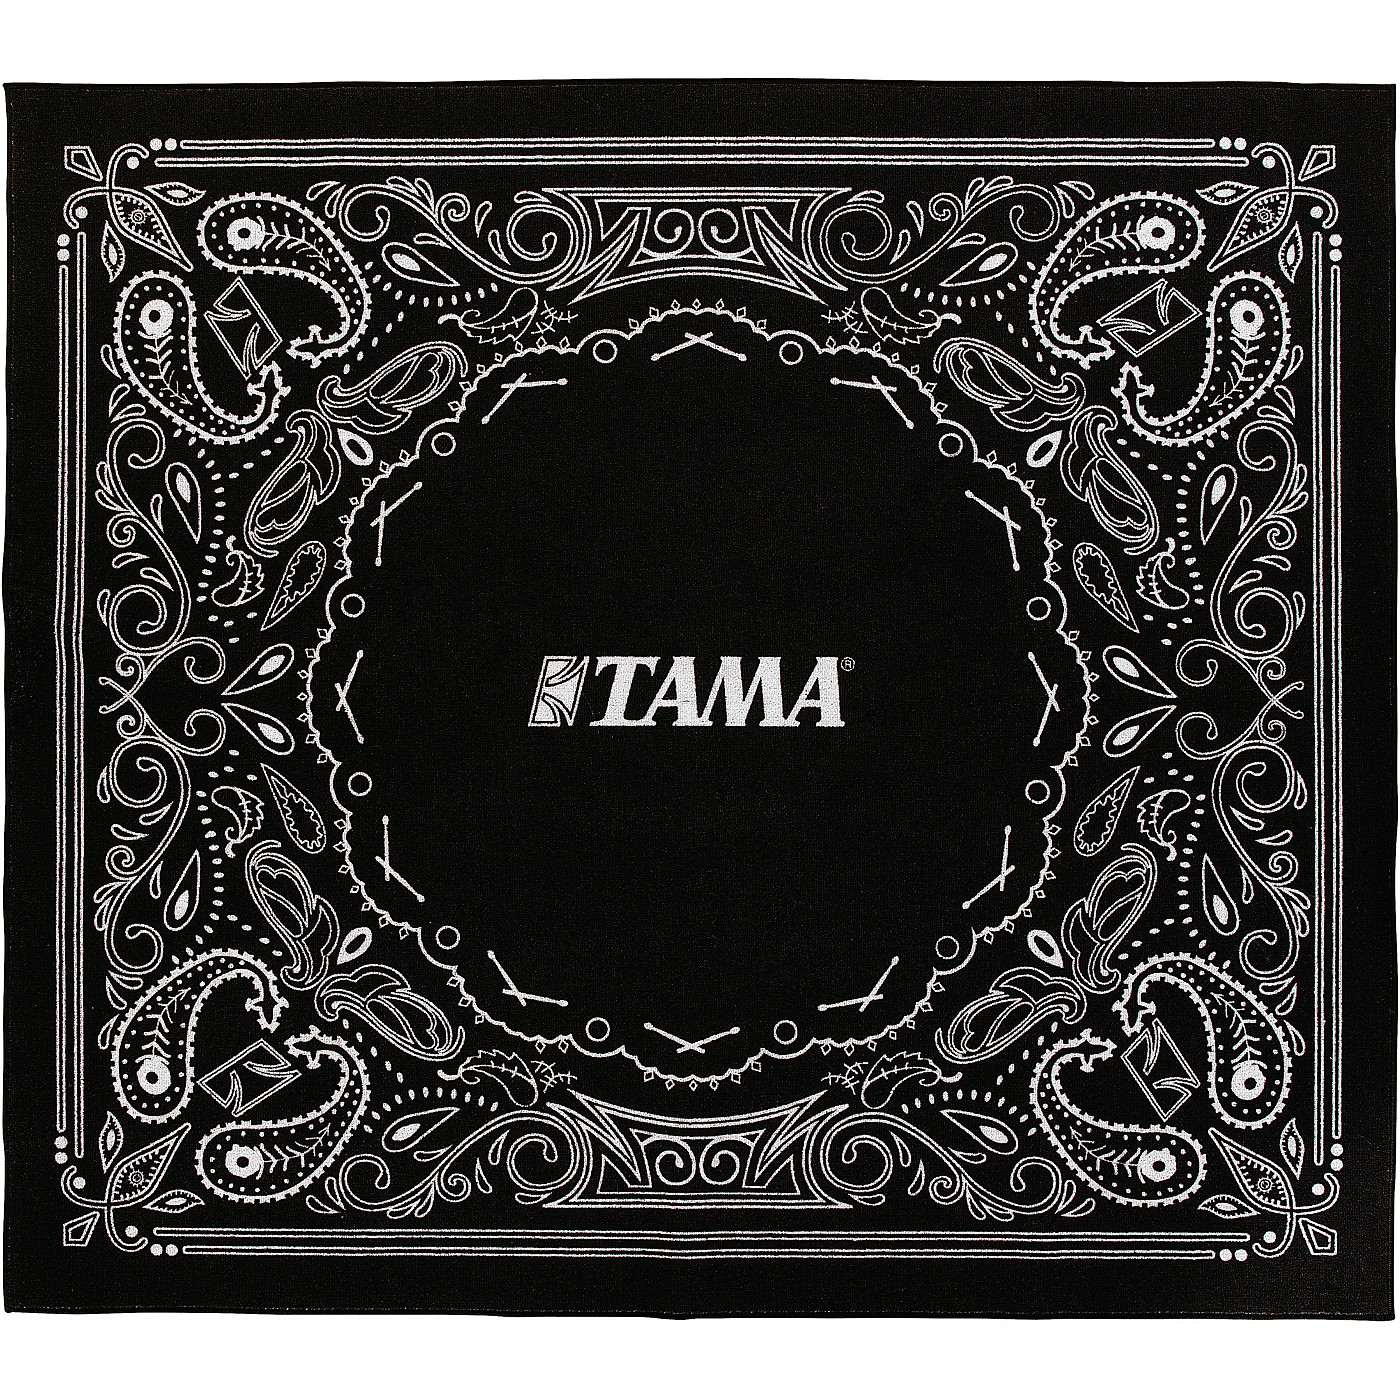 TAMA Drum Rug thumbnail